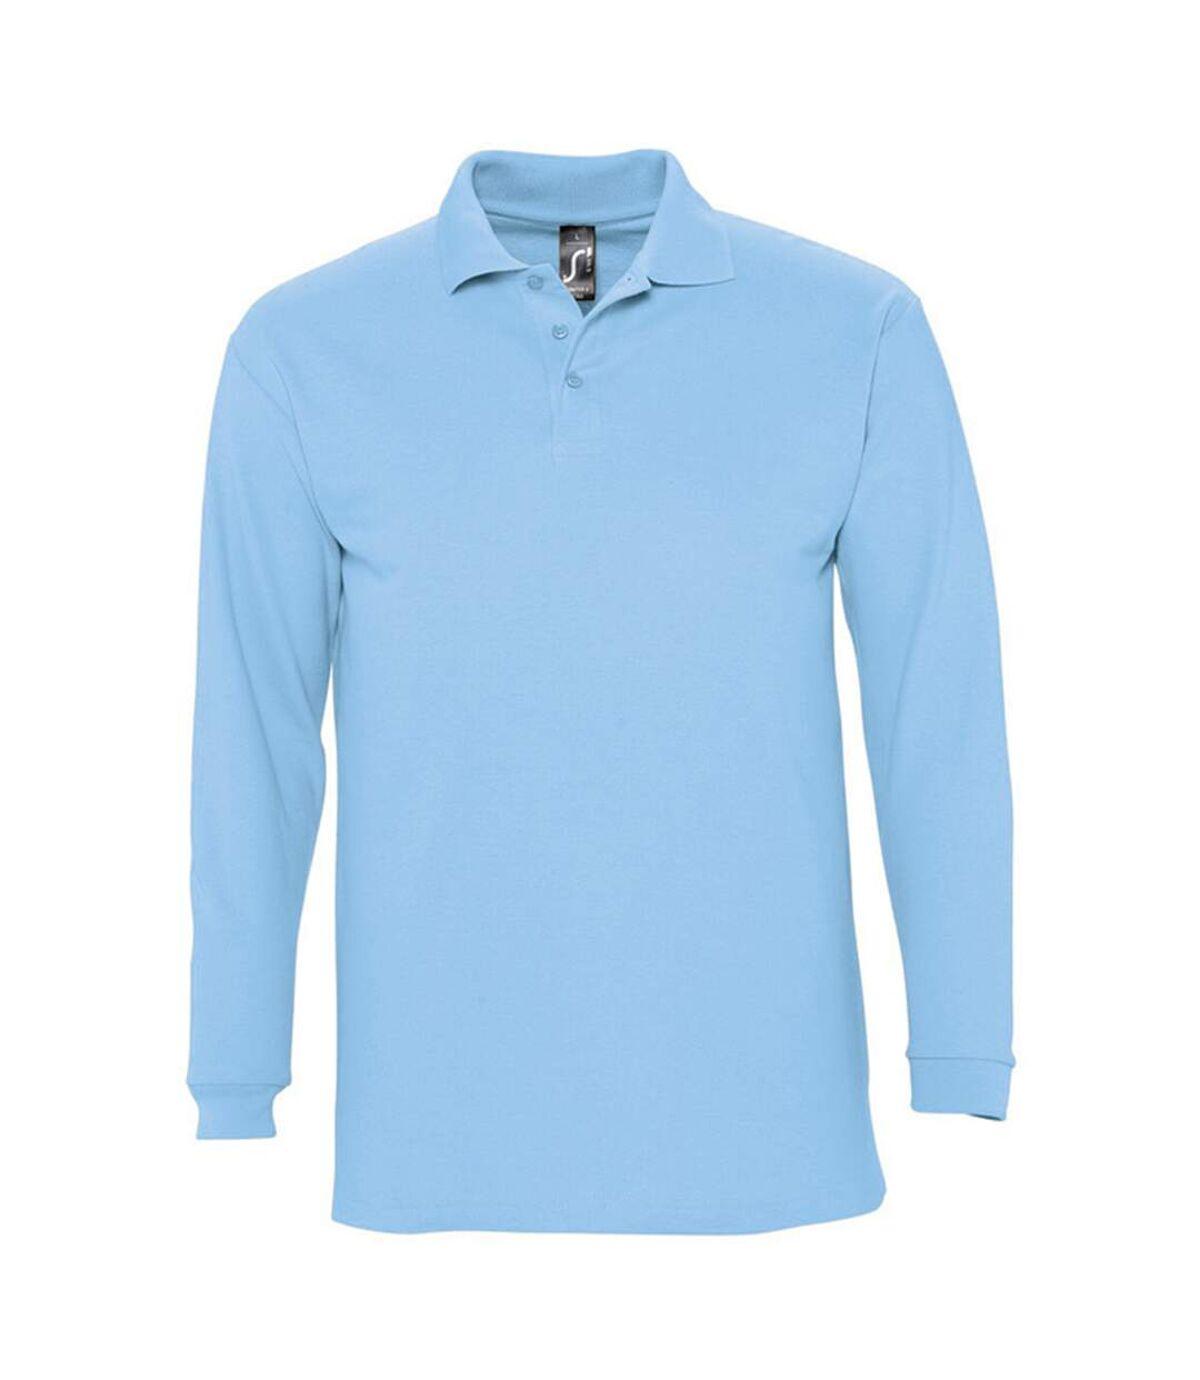 SOLS Mens Winter II Long Sleeve Pique Cotton Polo Shirt (Sky) - UTPC329